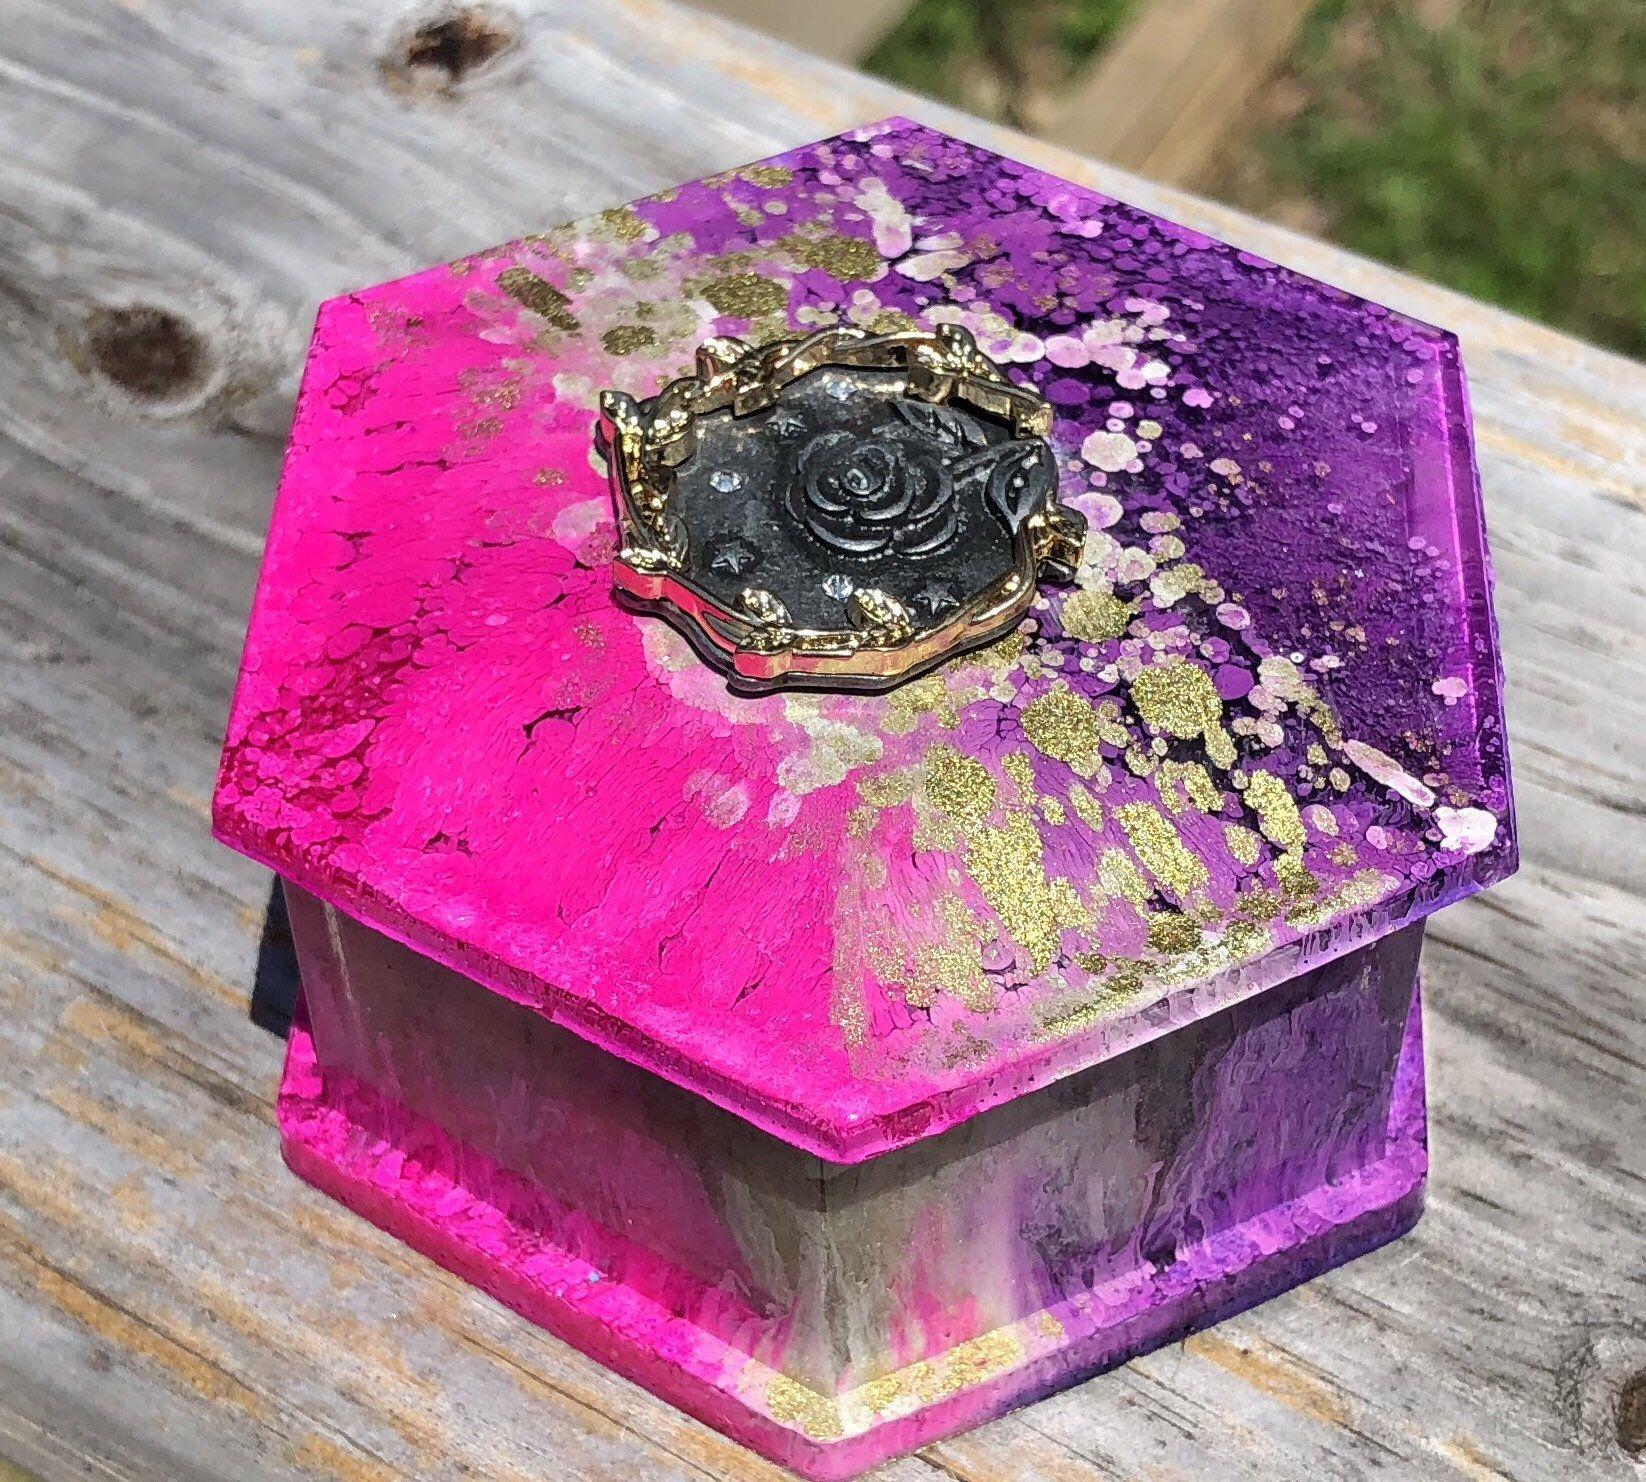 Rose jewelry/trinket box Trinket boxes, Rose jewelry